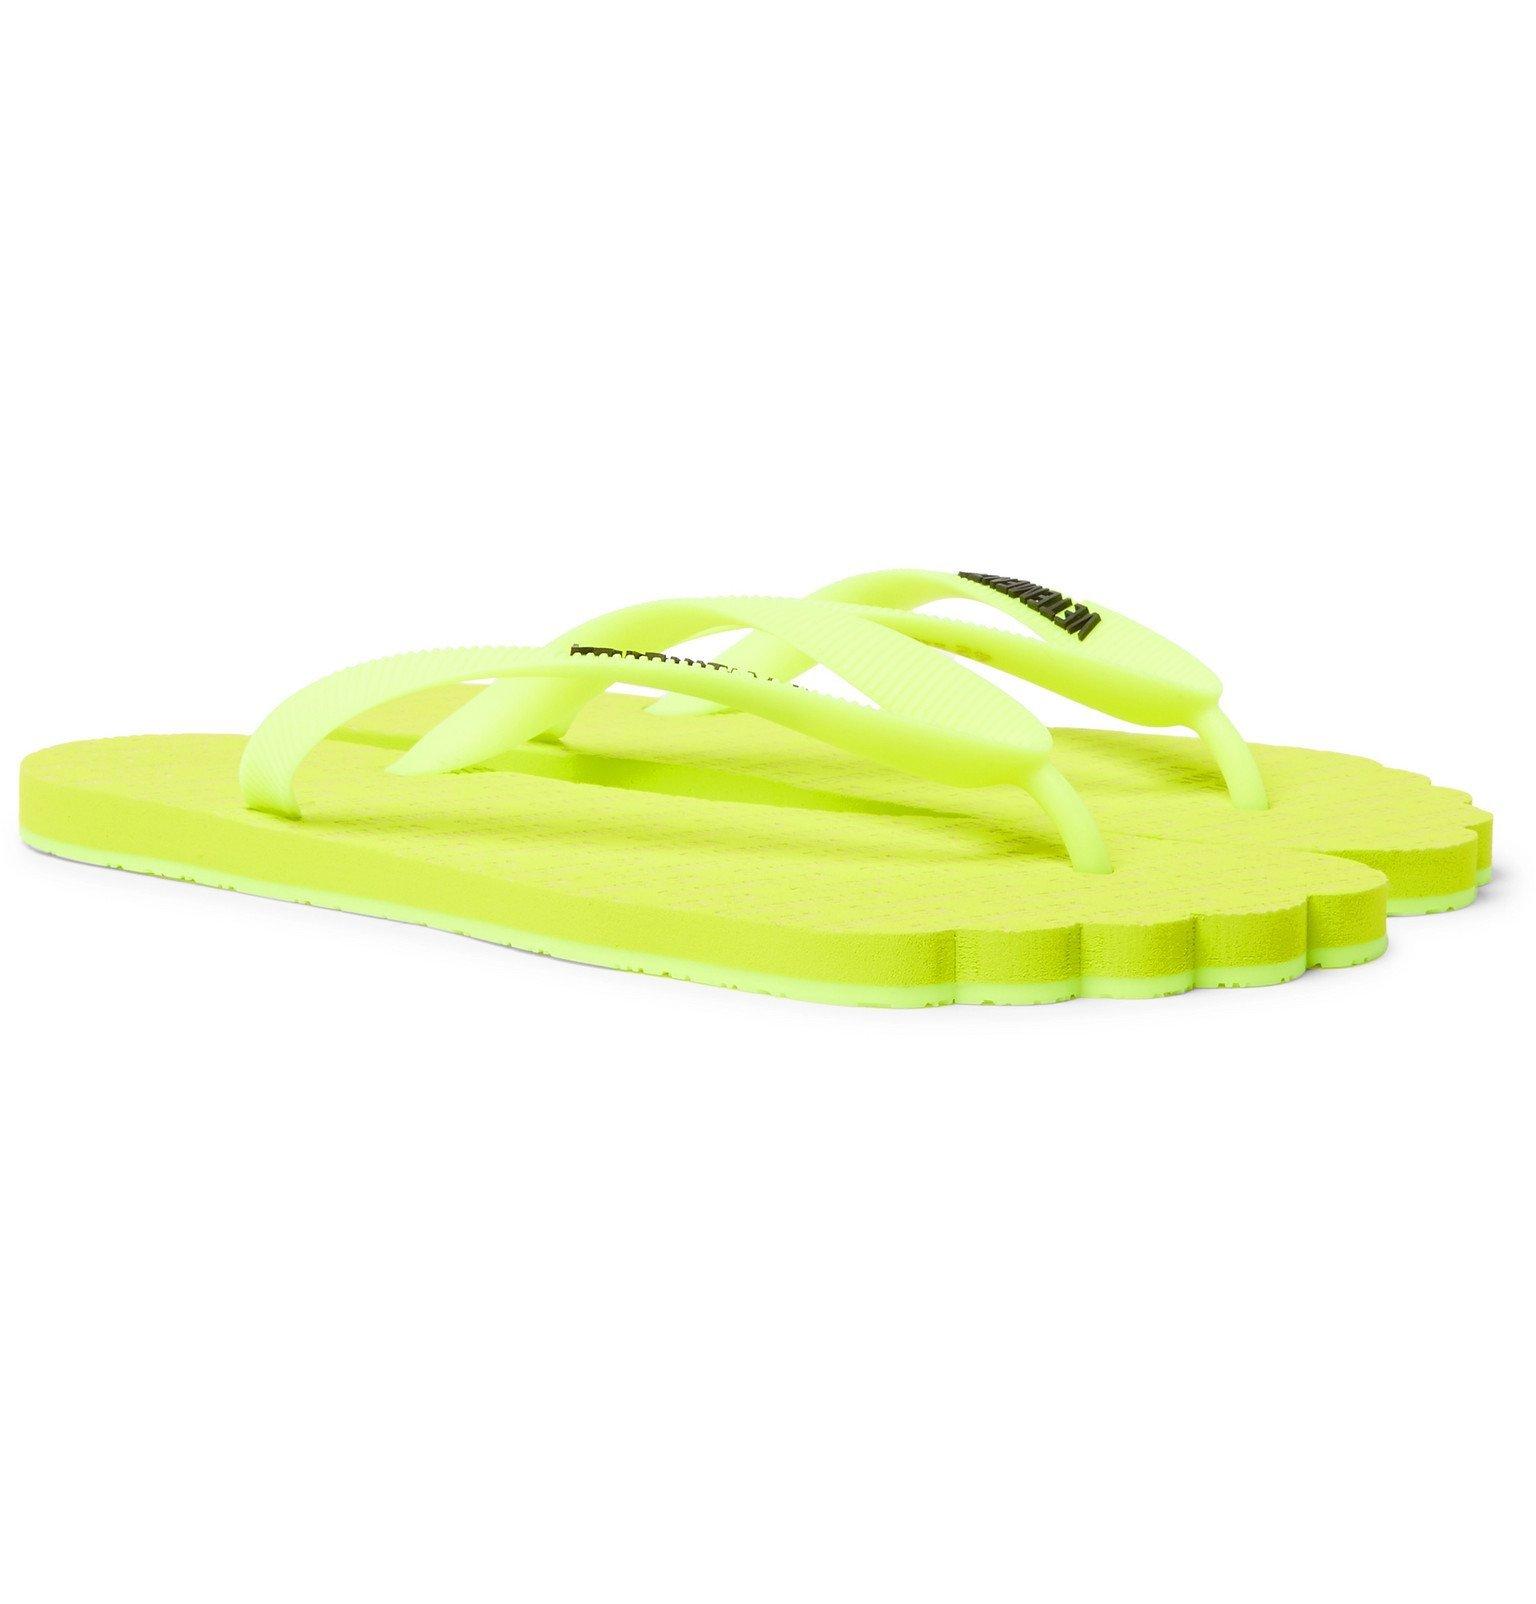 Photo: Vetements - Anatomic Logo-Print Neon Rubber Flip Flops - Yellow